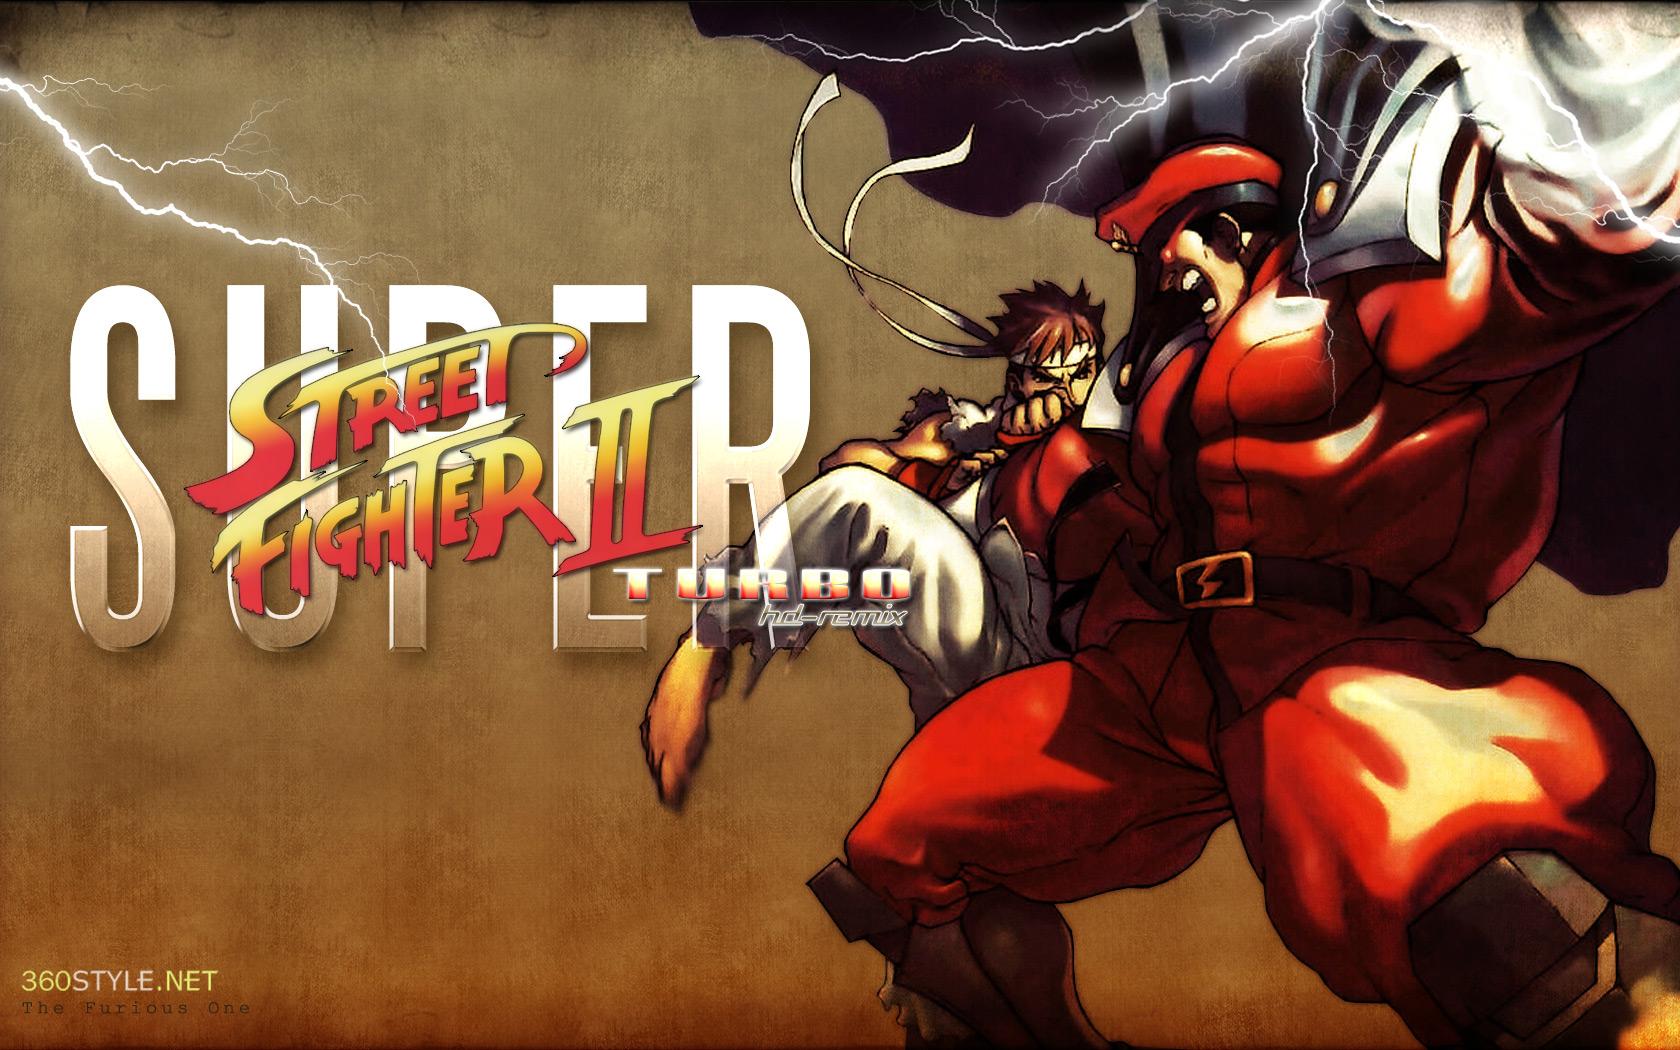 Super street fighter 2 turbo by f 1 on deviantart - Street fighter 2 wallpaper hd ...